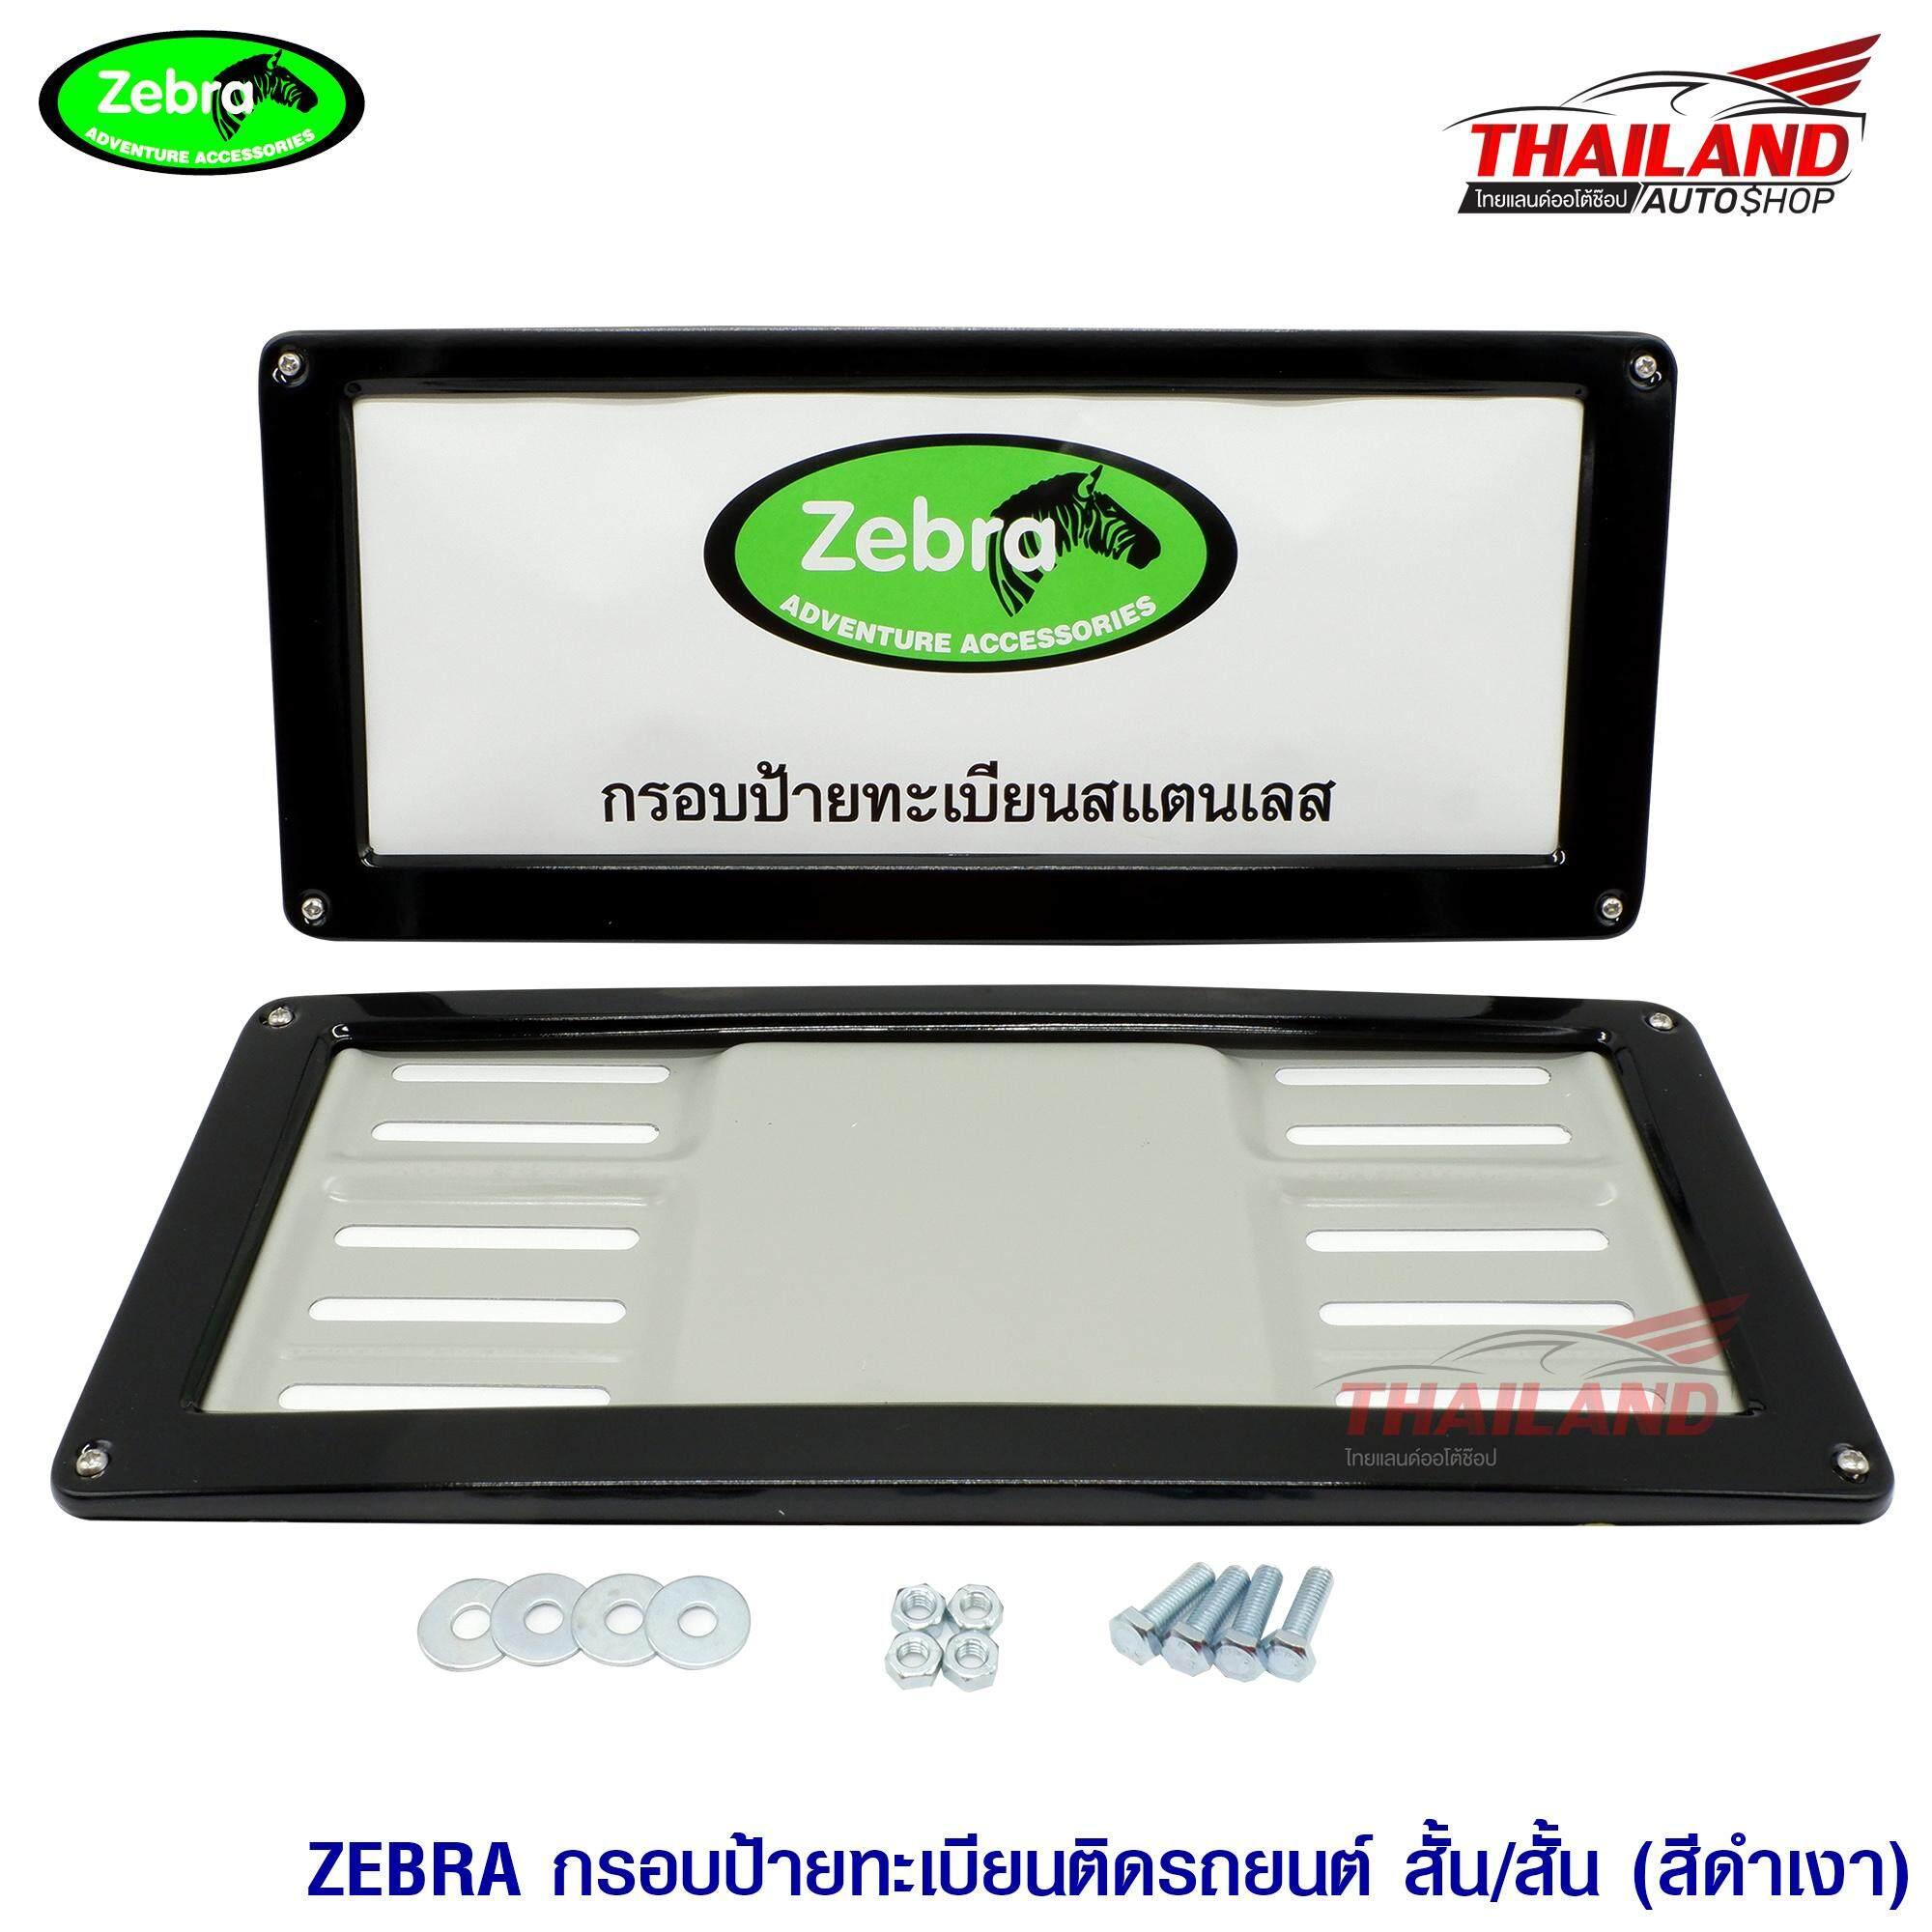 Thailand กรอบป้ายทะเบียนติดรถยนต์ Zebra สีดำเงา จำนวน 1 ชุด By Thailand Auto Shop.